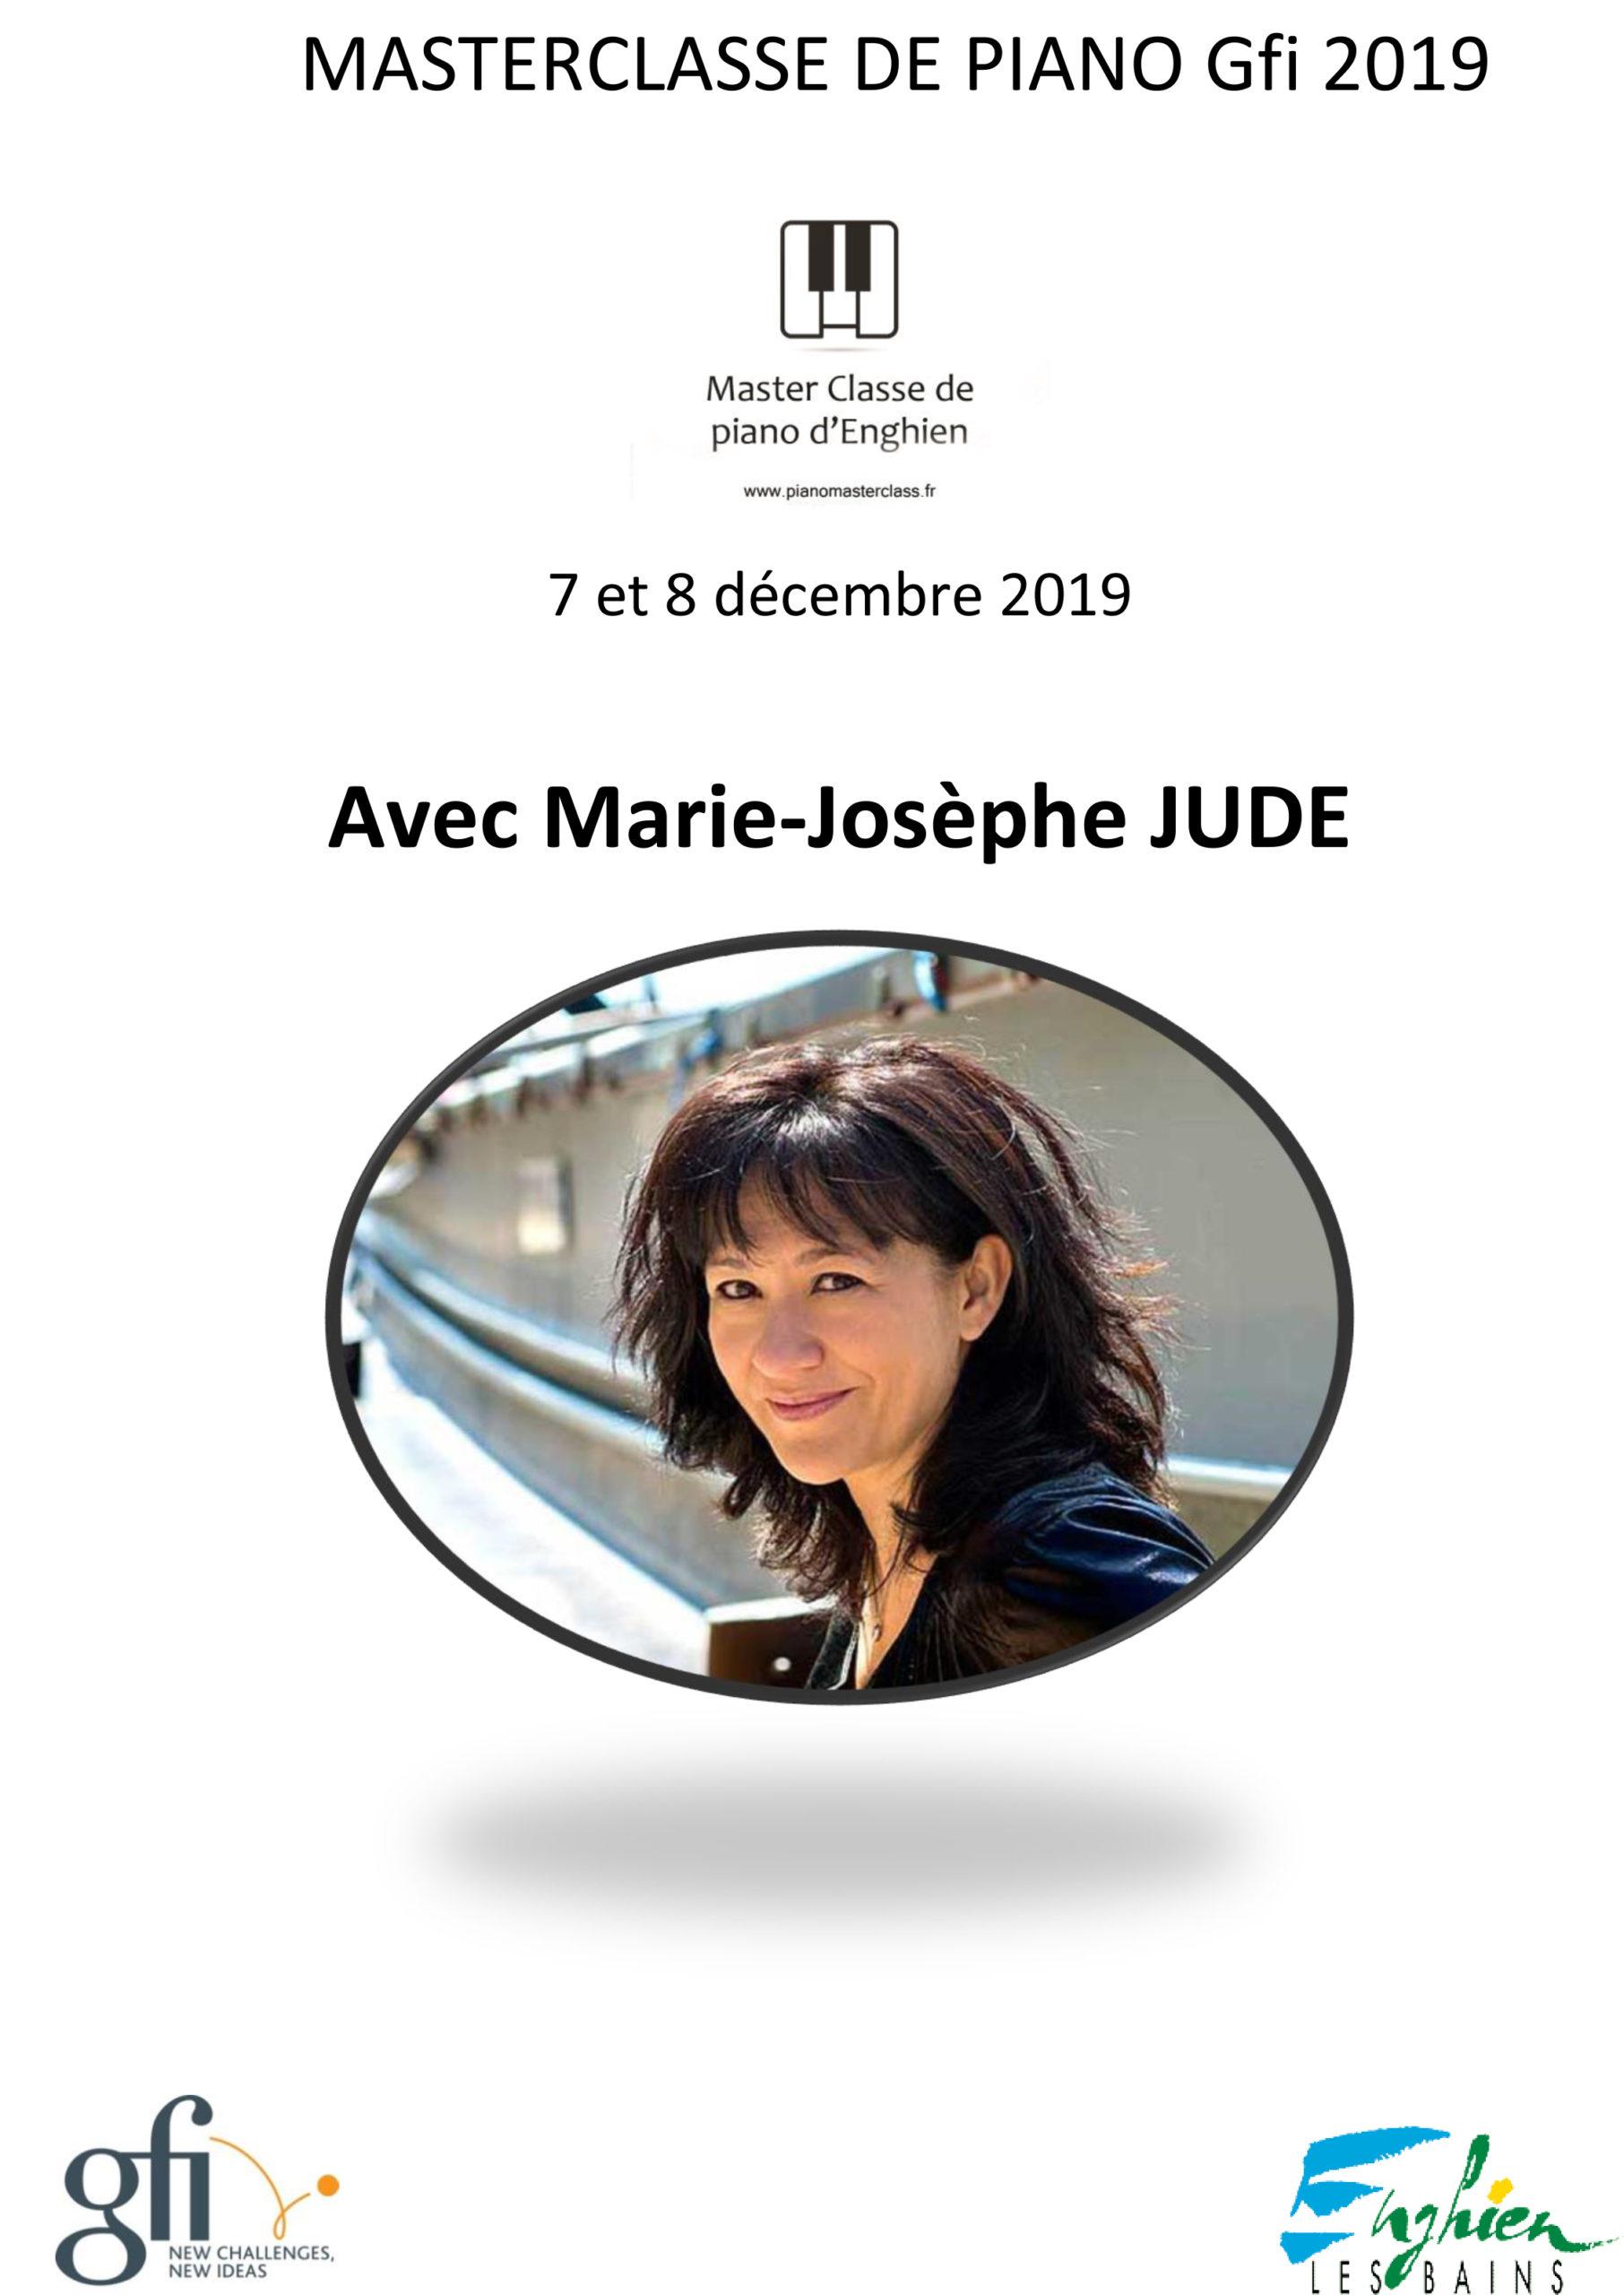 Interview de Marie-Josèphe Jude